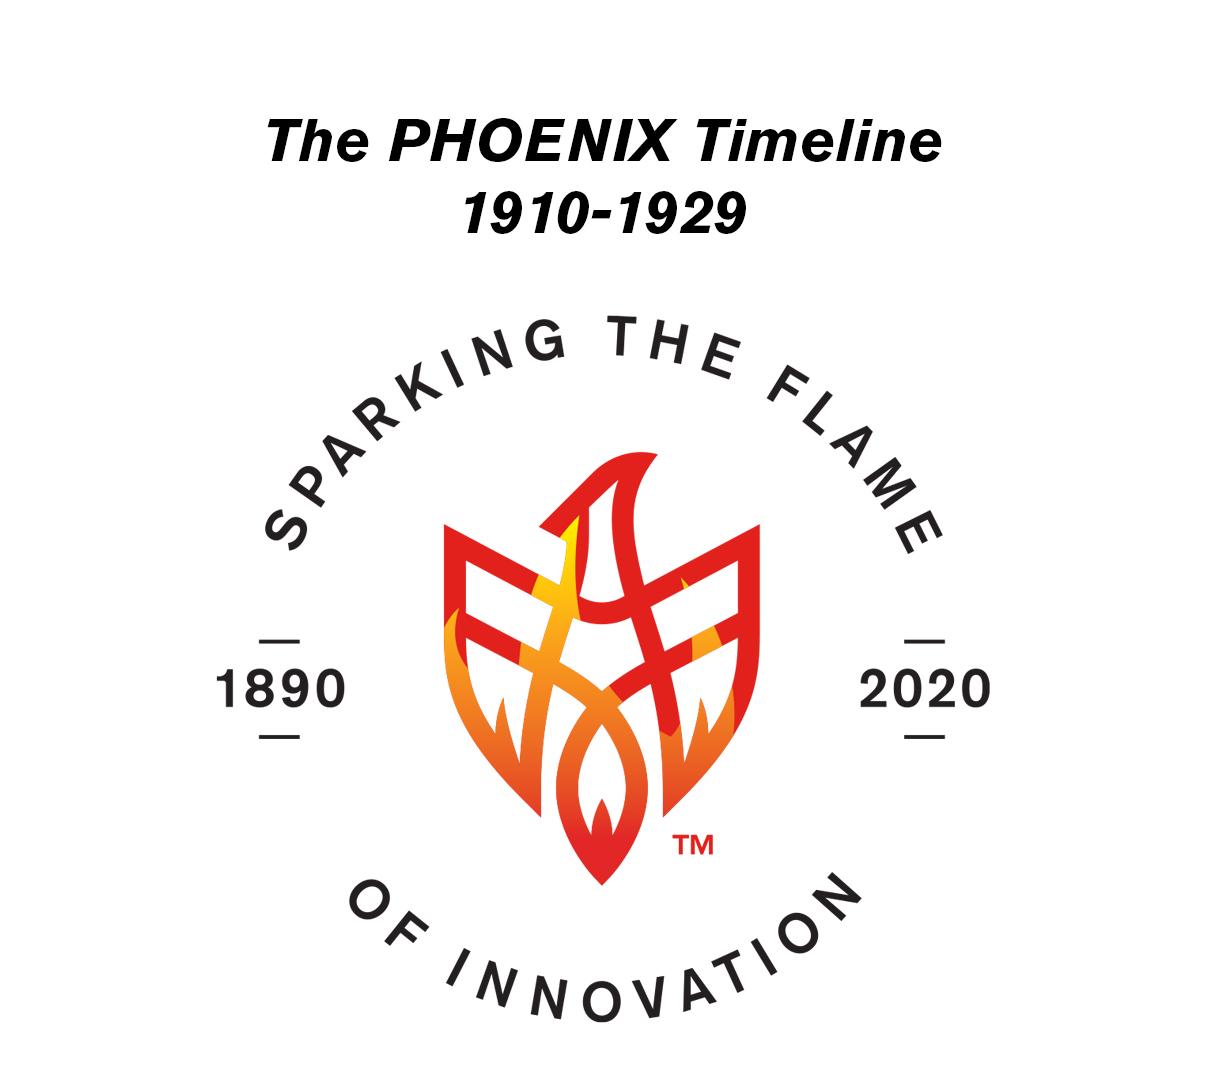 PHOENIX Celebrates 130 Years: 1910-1929 Timeline